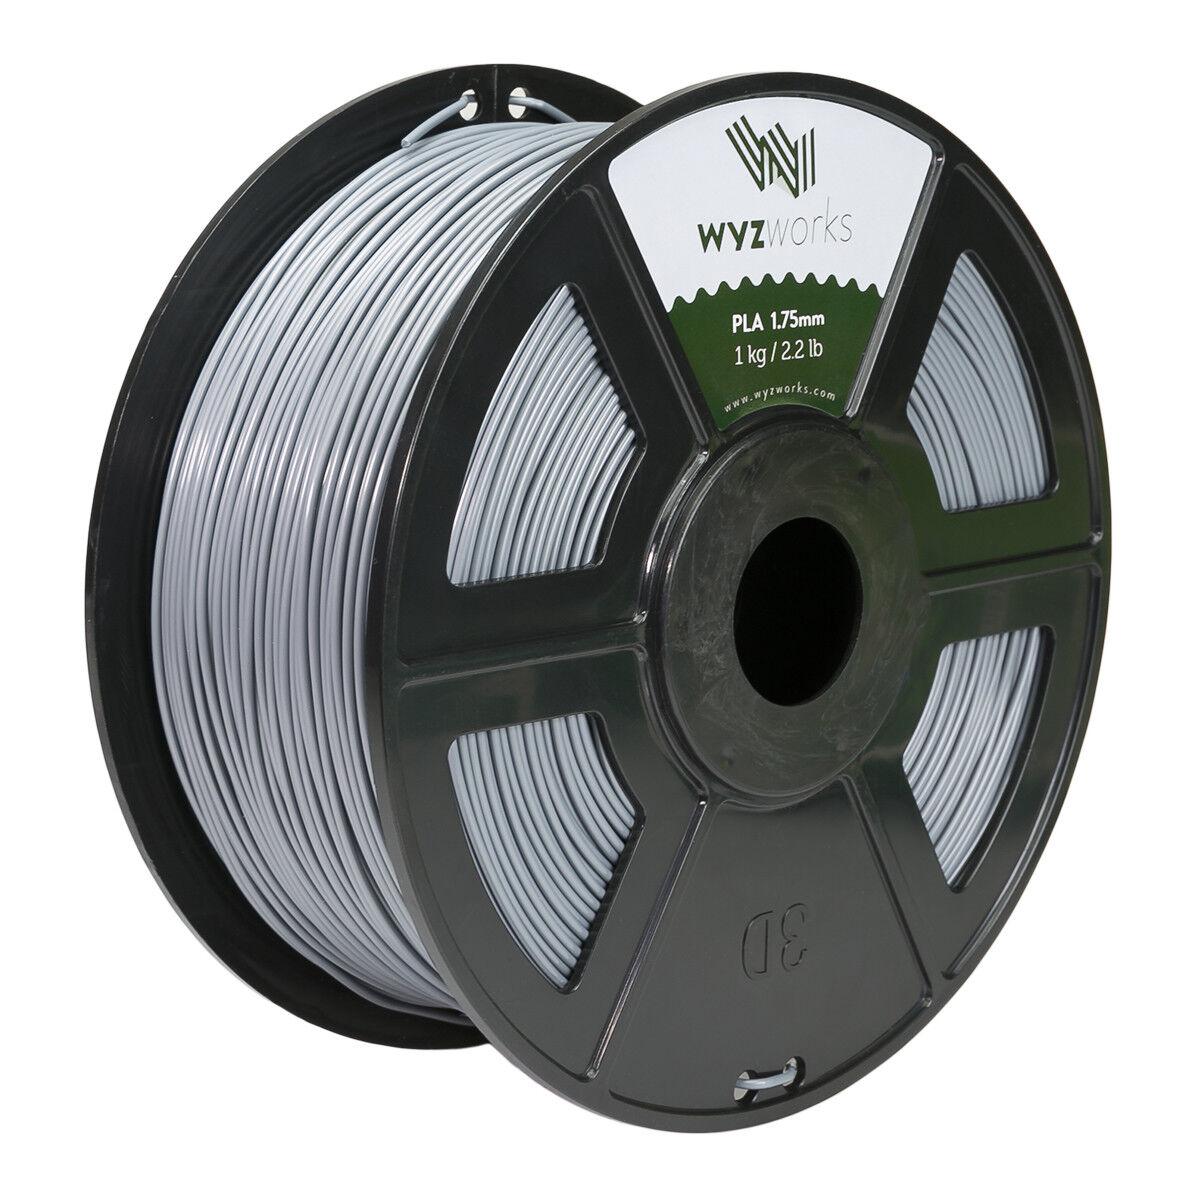 Light Grey PLA 1.75mm WYZworks 3D Printer Premium Filament 1kg//2.2lb